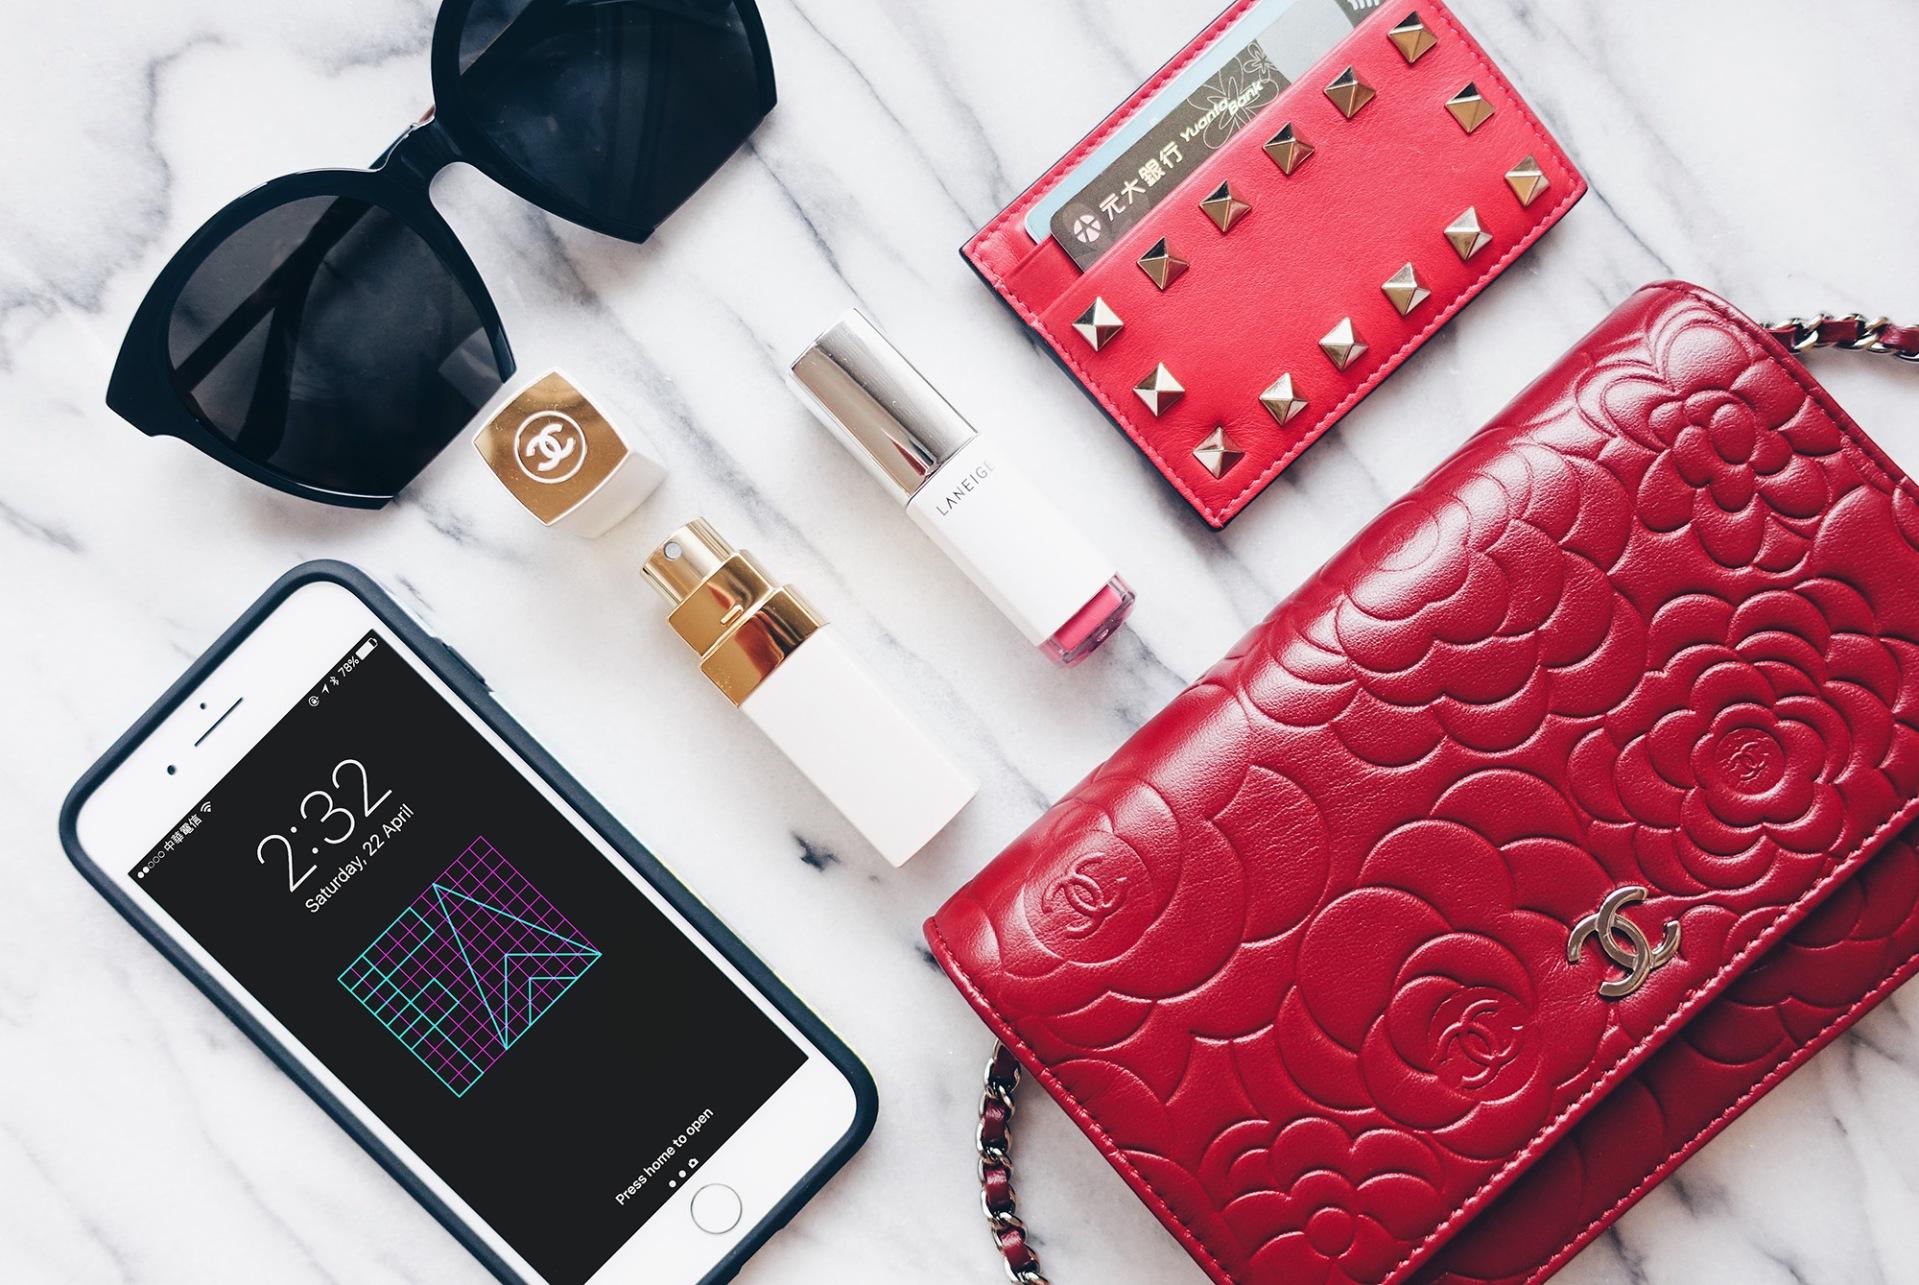 Chanel 摩登 COCO 隨身香水禮盒 purse purfume